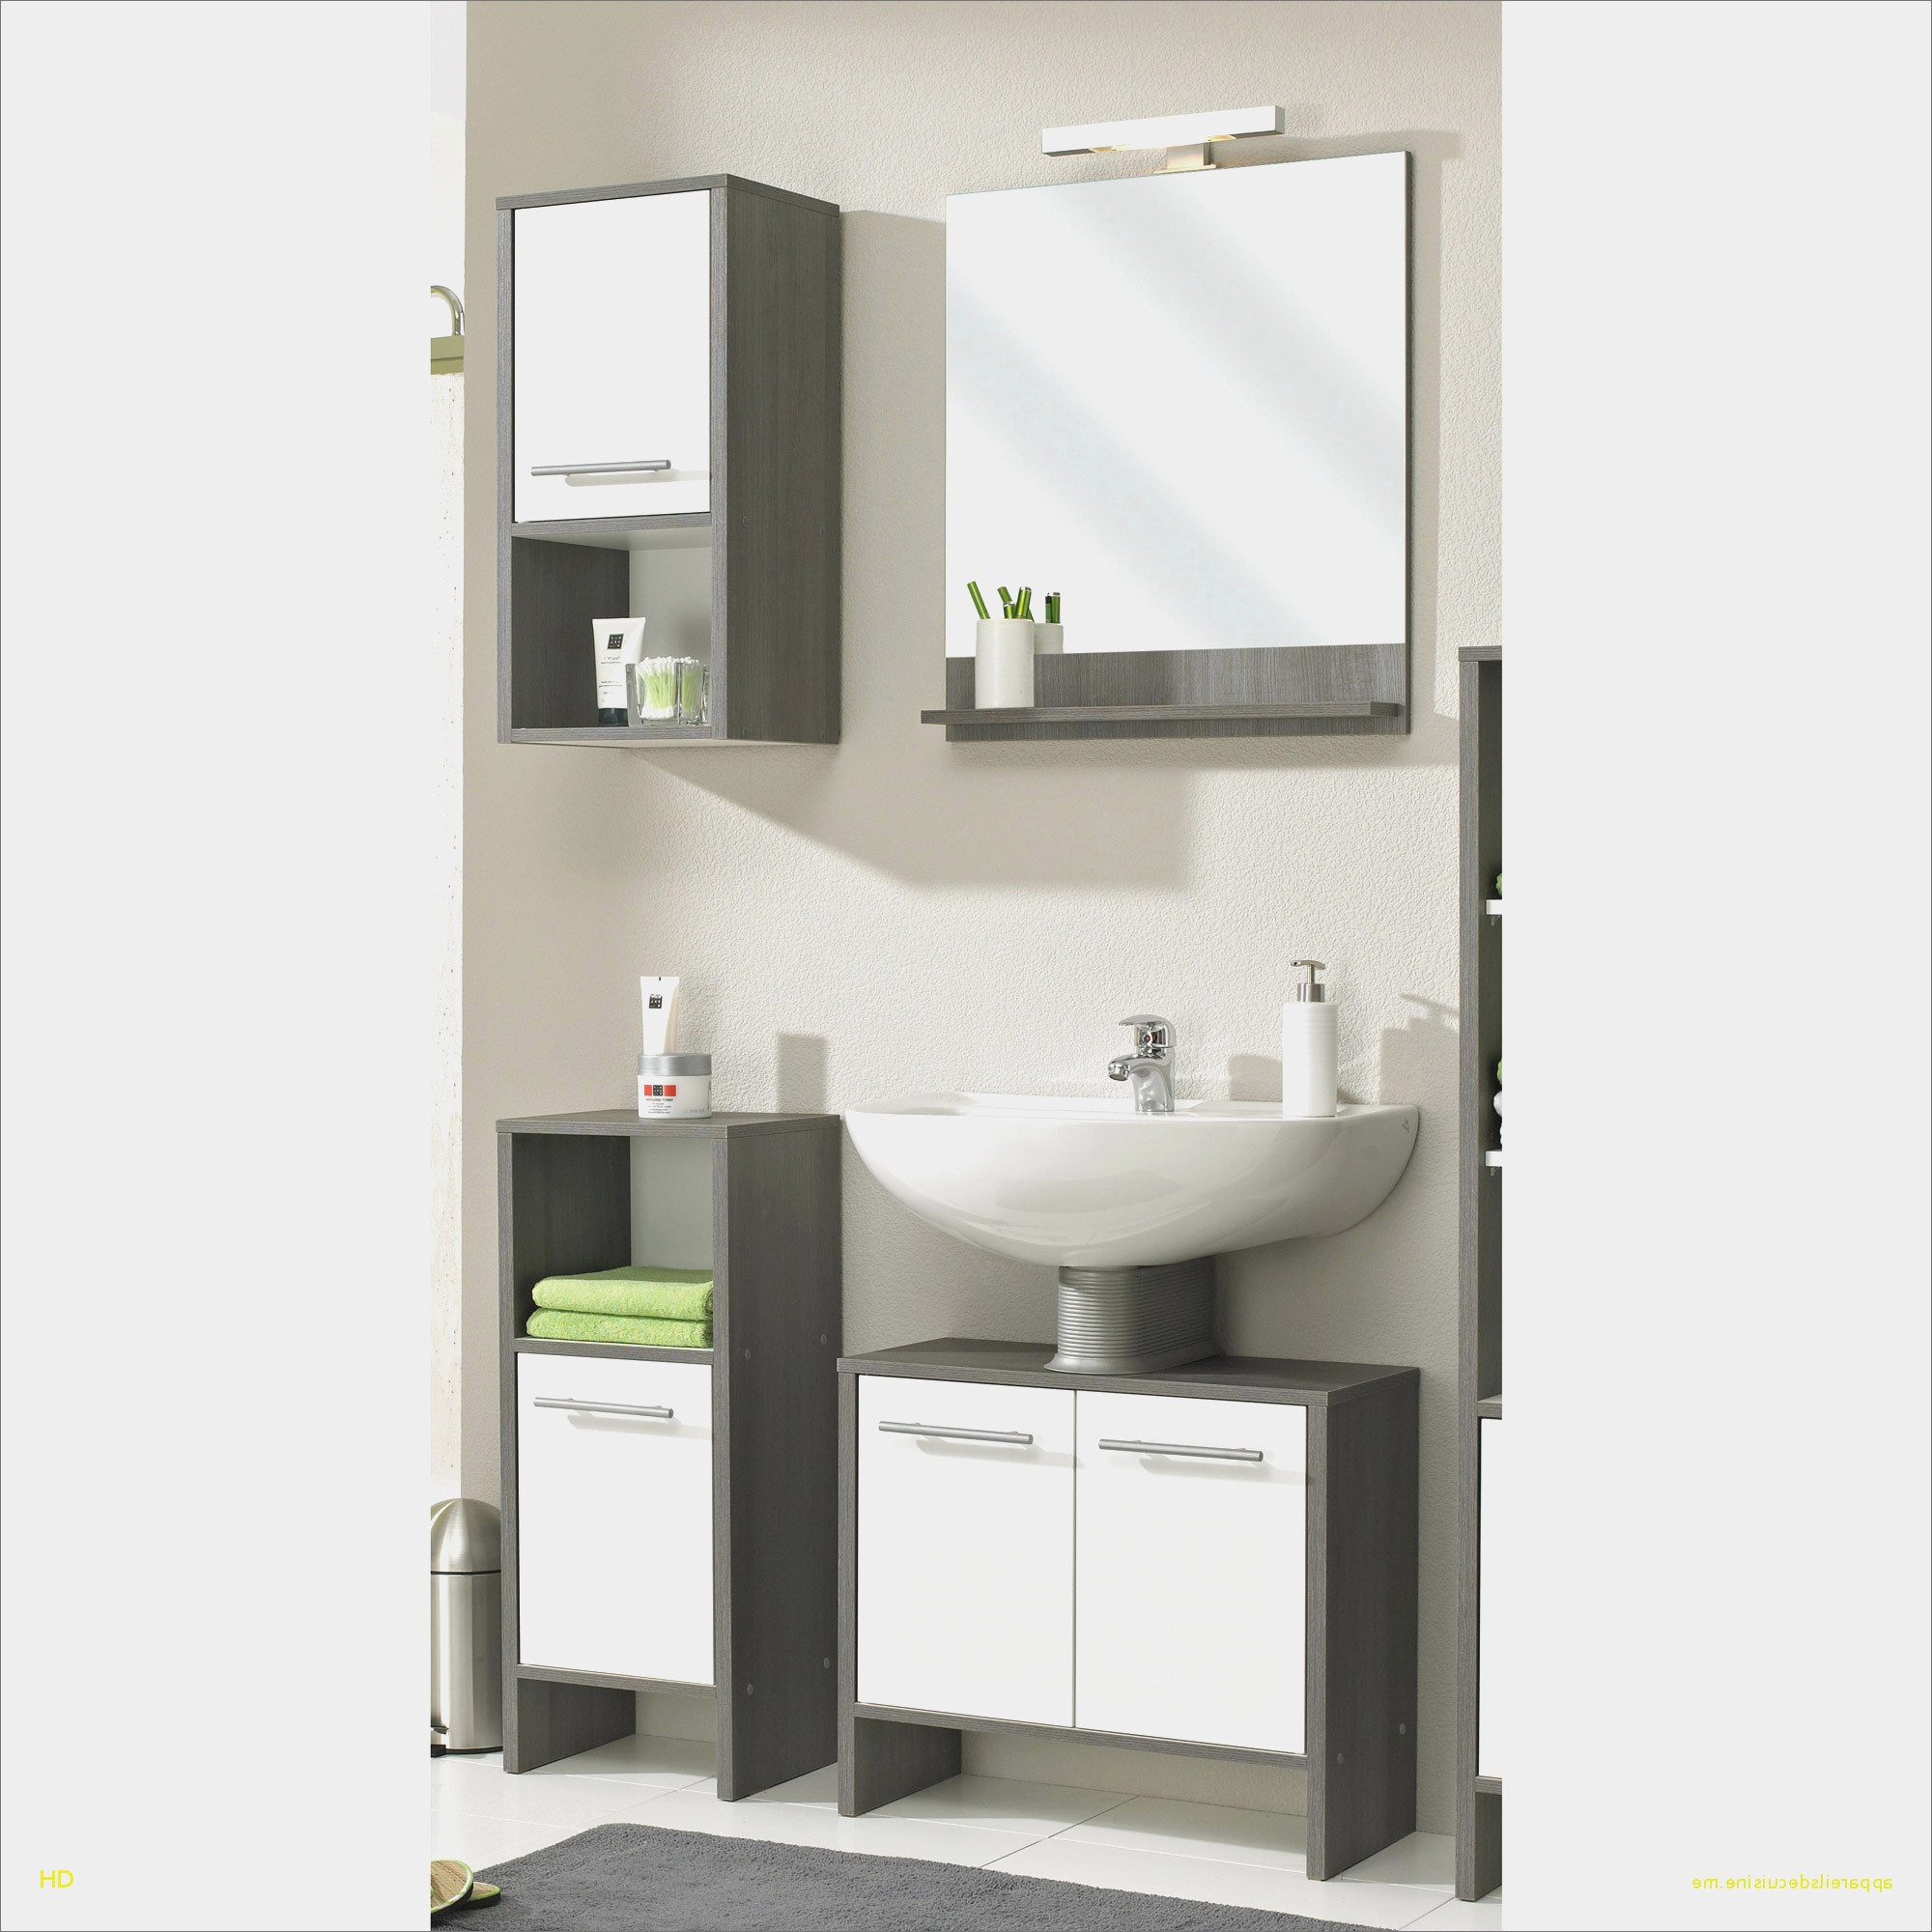 salle de bain ikea 2017 beau photos spot salle de bain ikea g nial ikea luminaire suspension. Black Bedroom Furniture Sets. Home Design Ideas